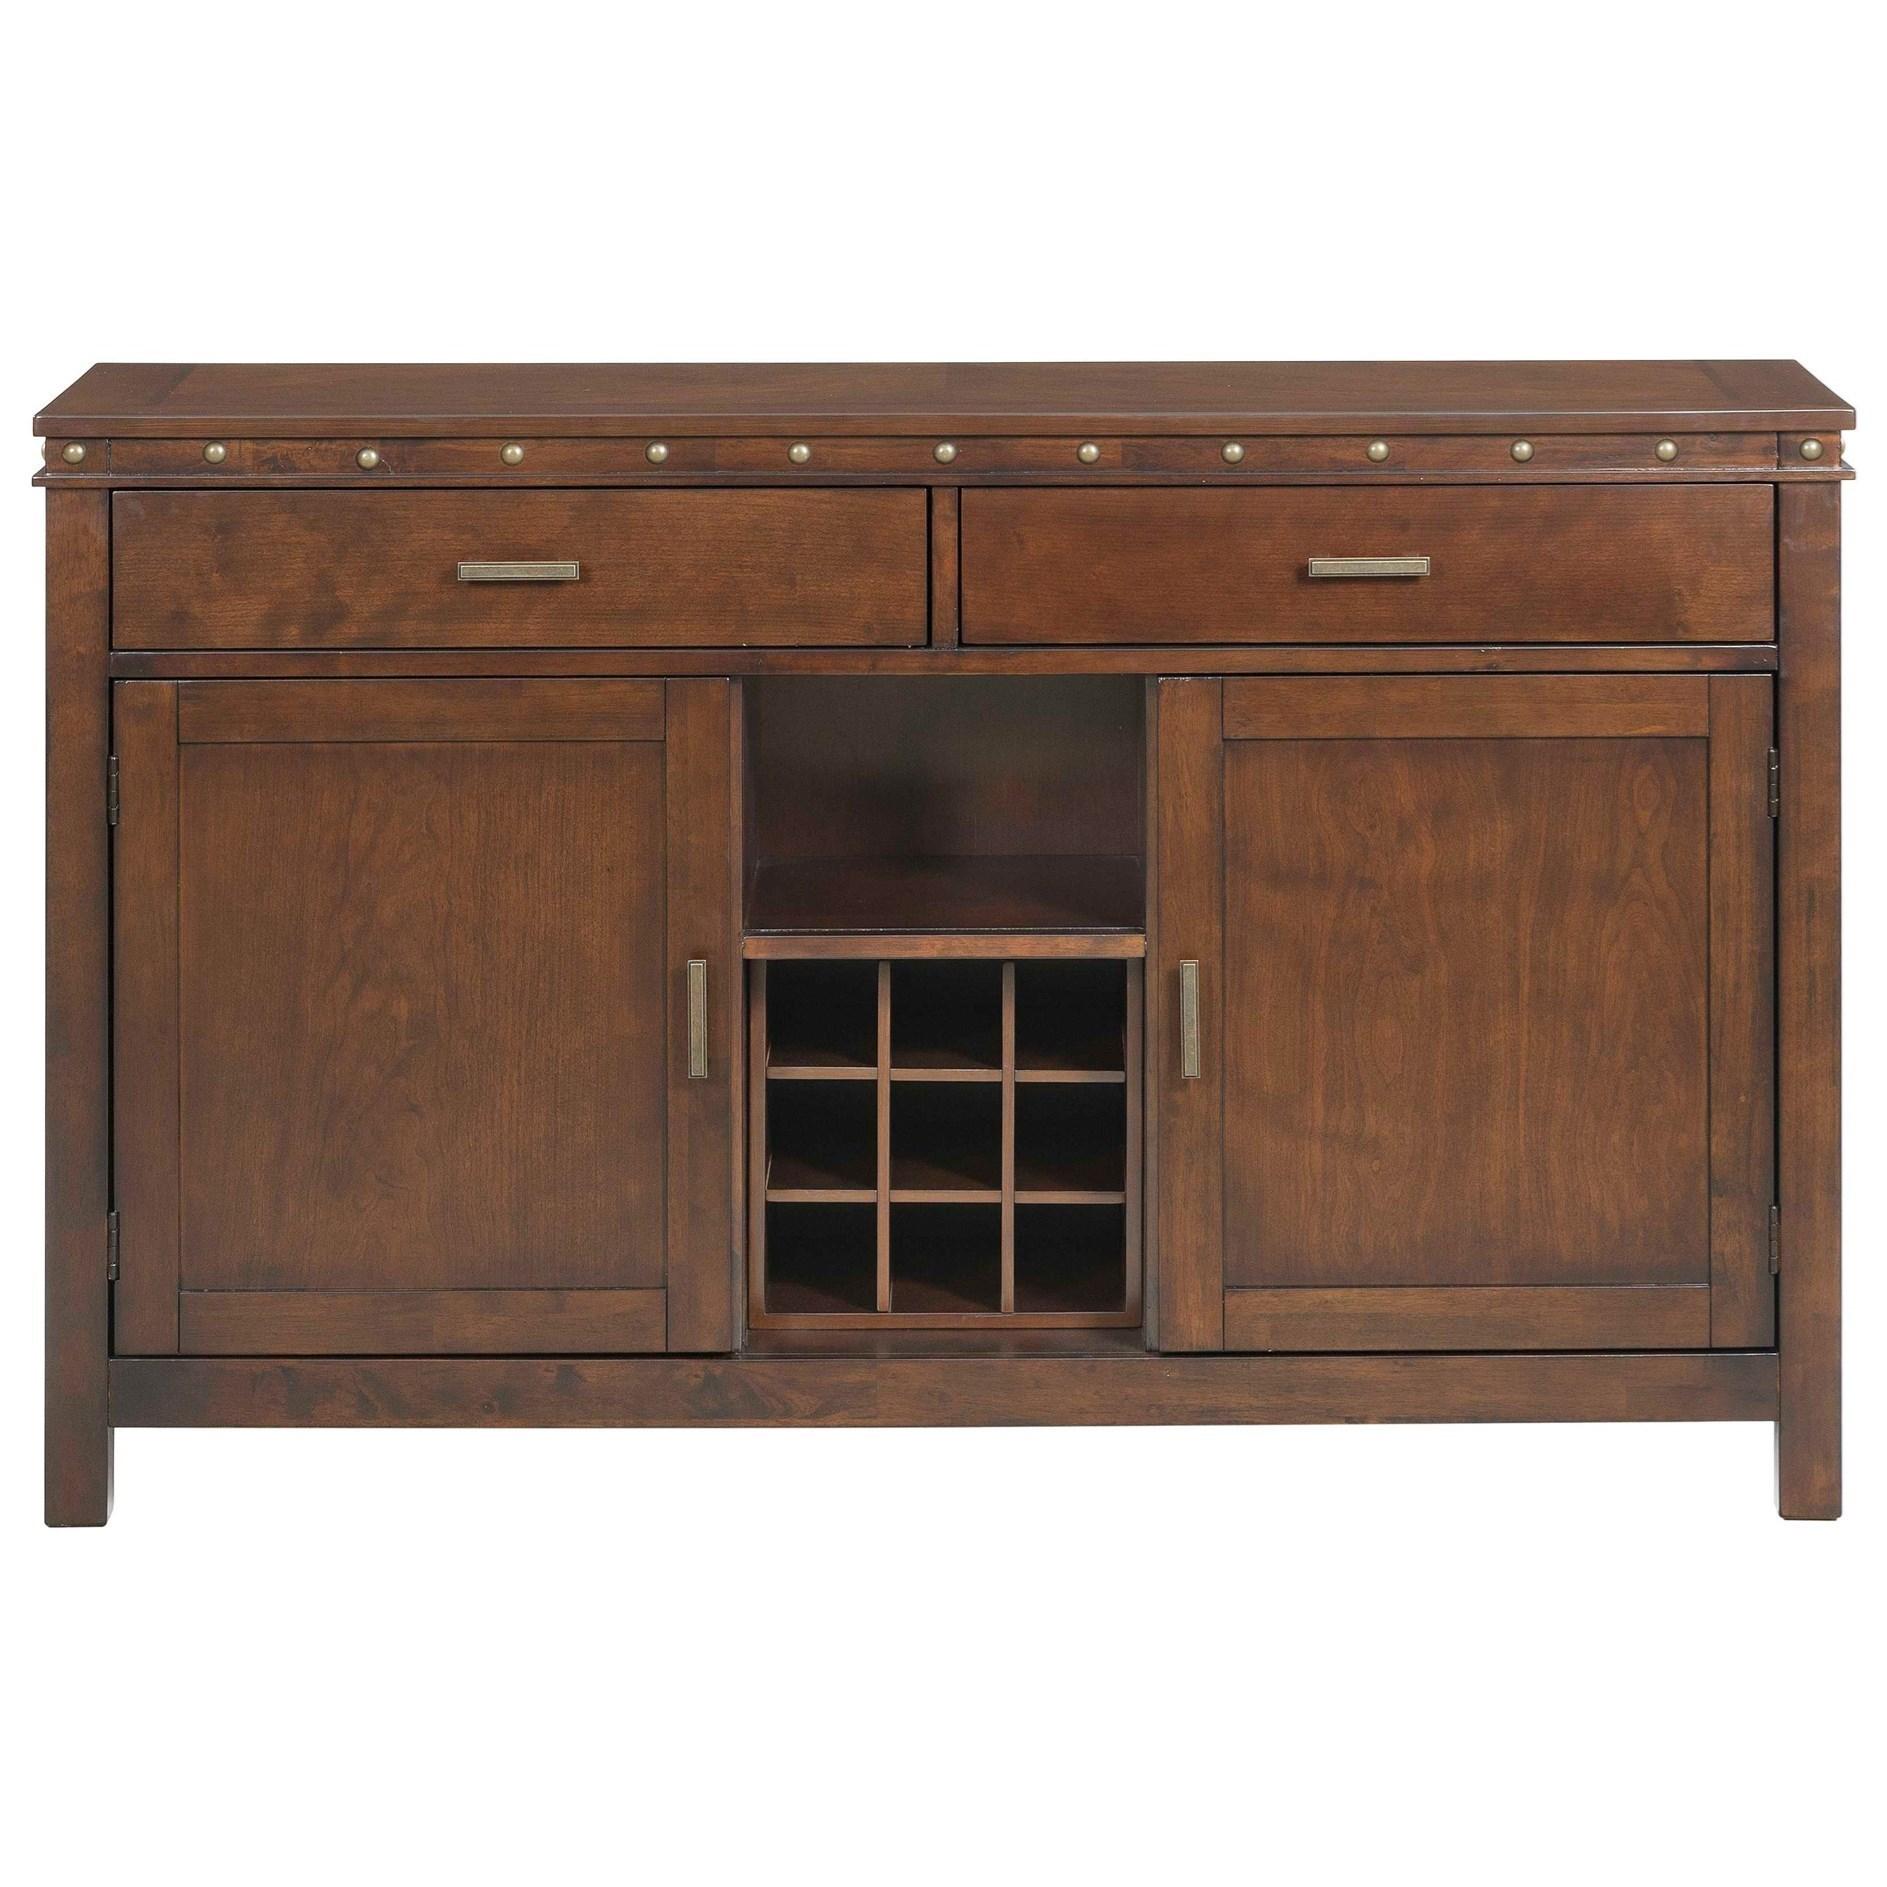 Prescott Server by Elements International at Smart Buy Furniture